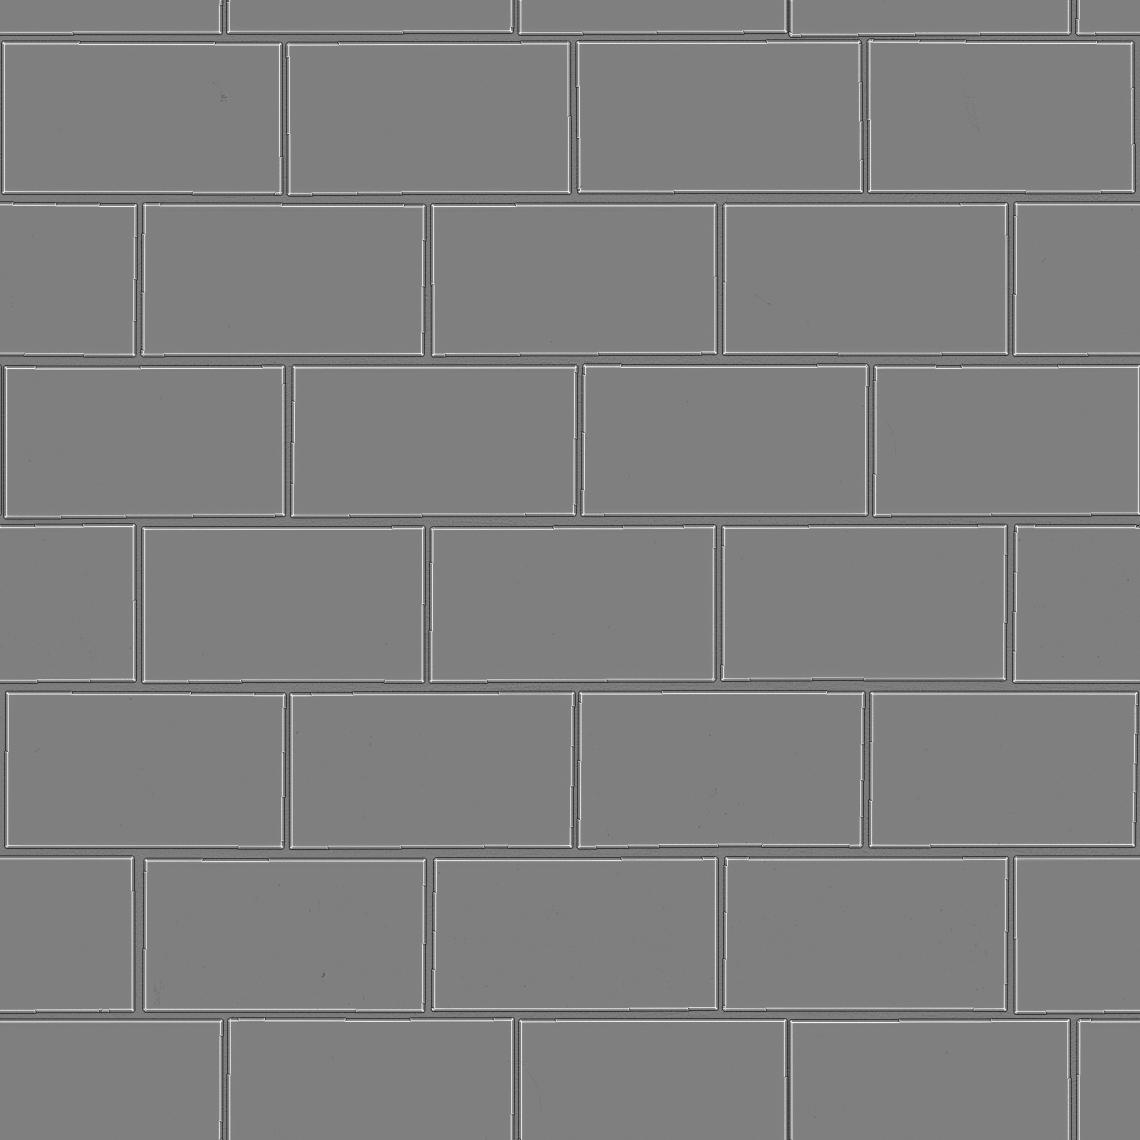 Simple-Tiles-02-Curvature